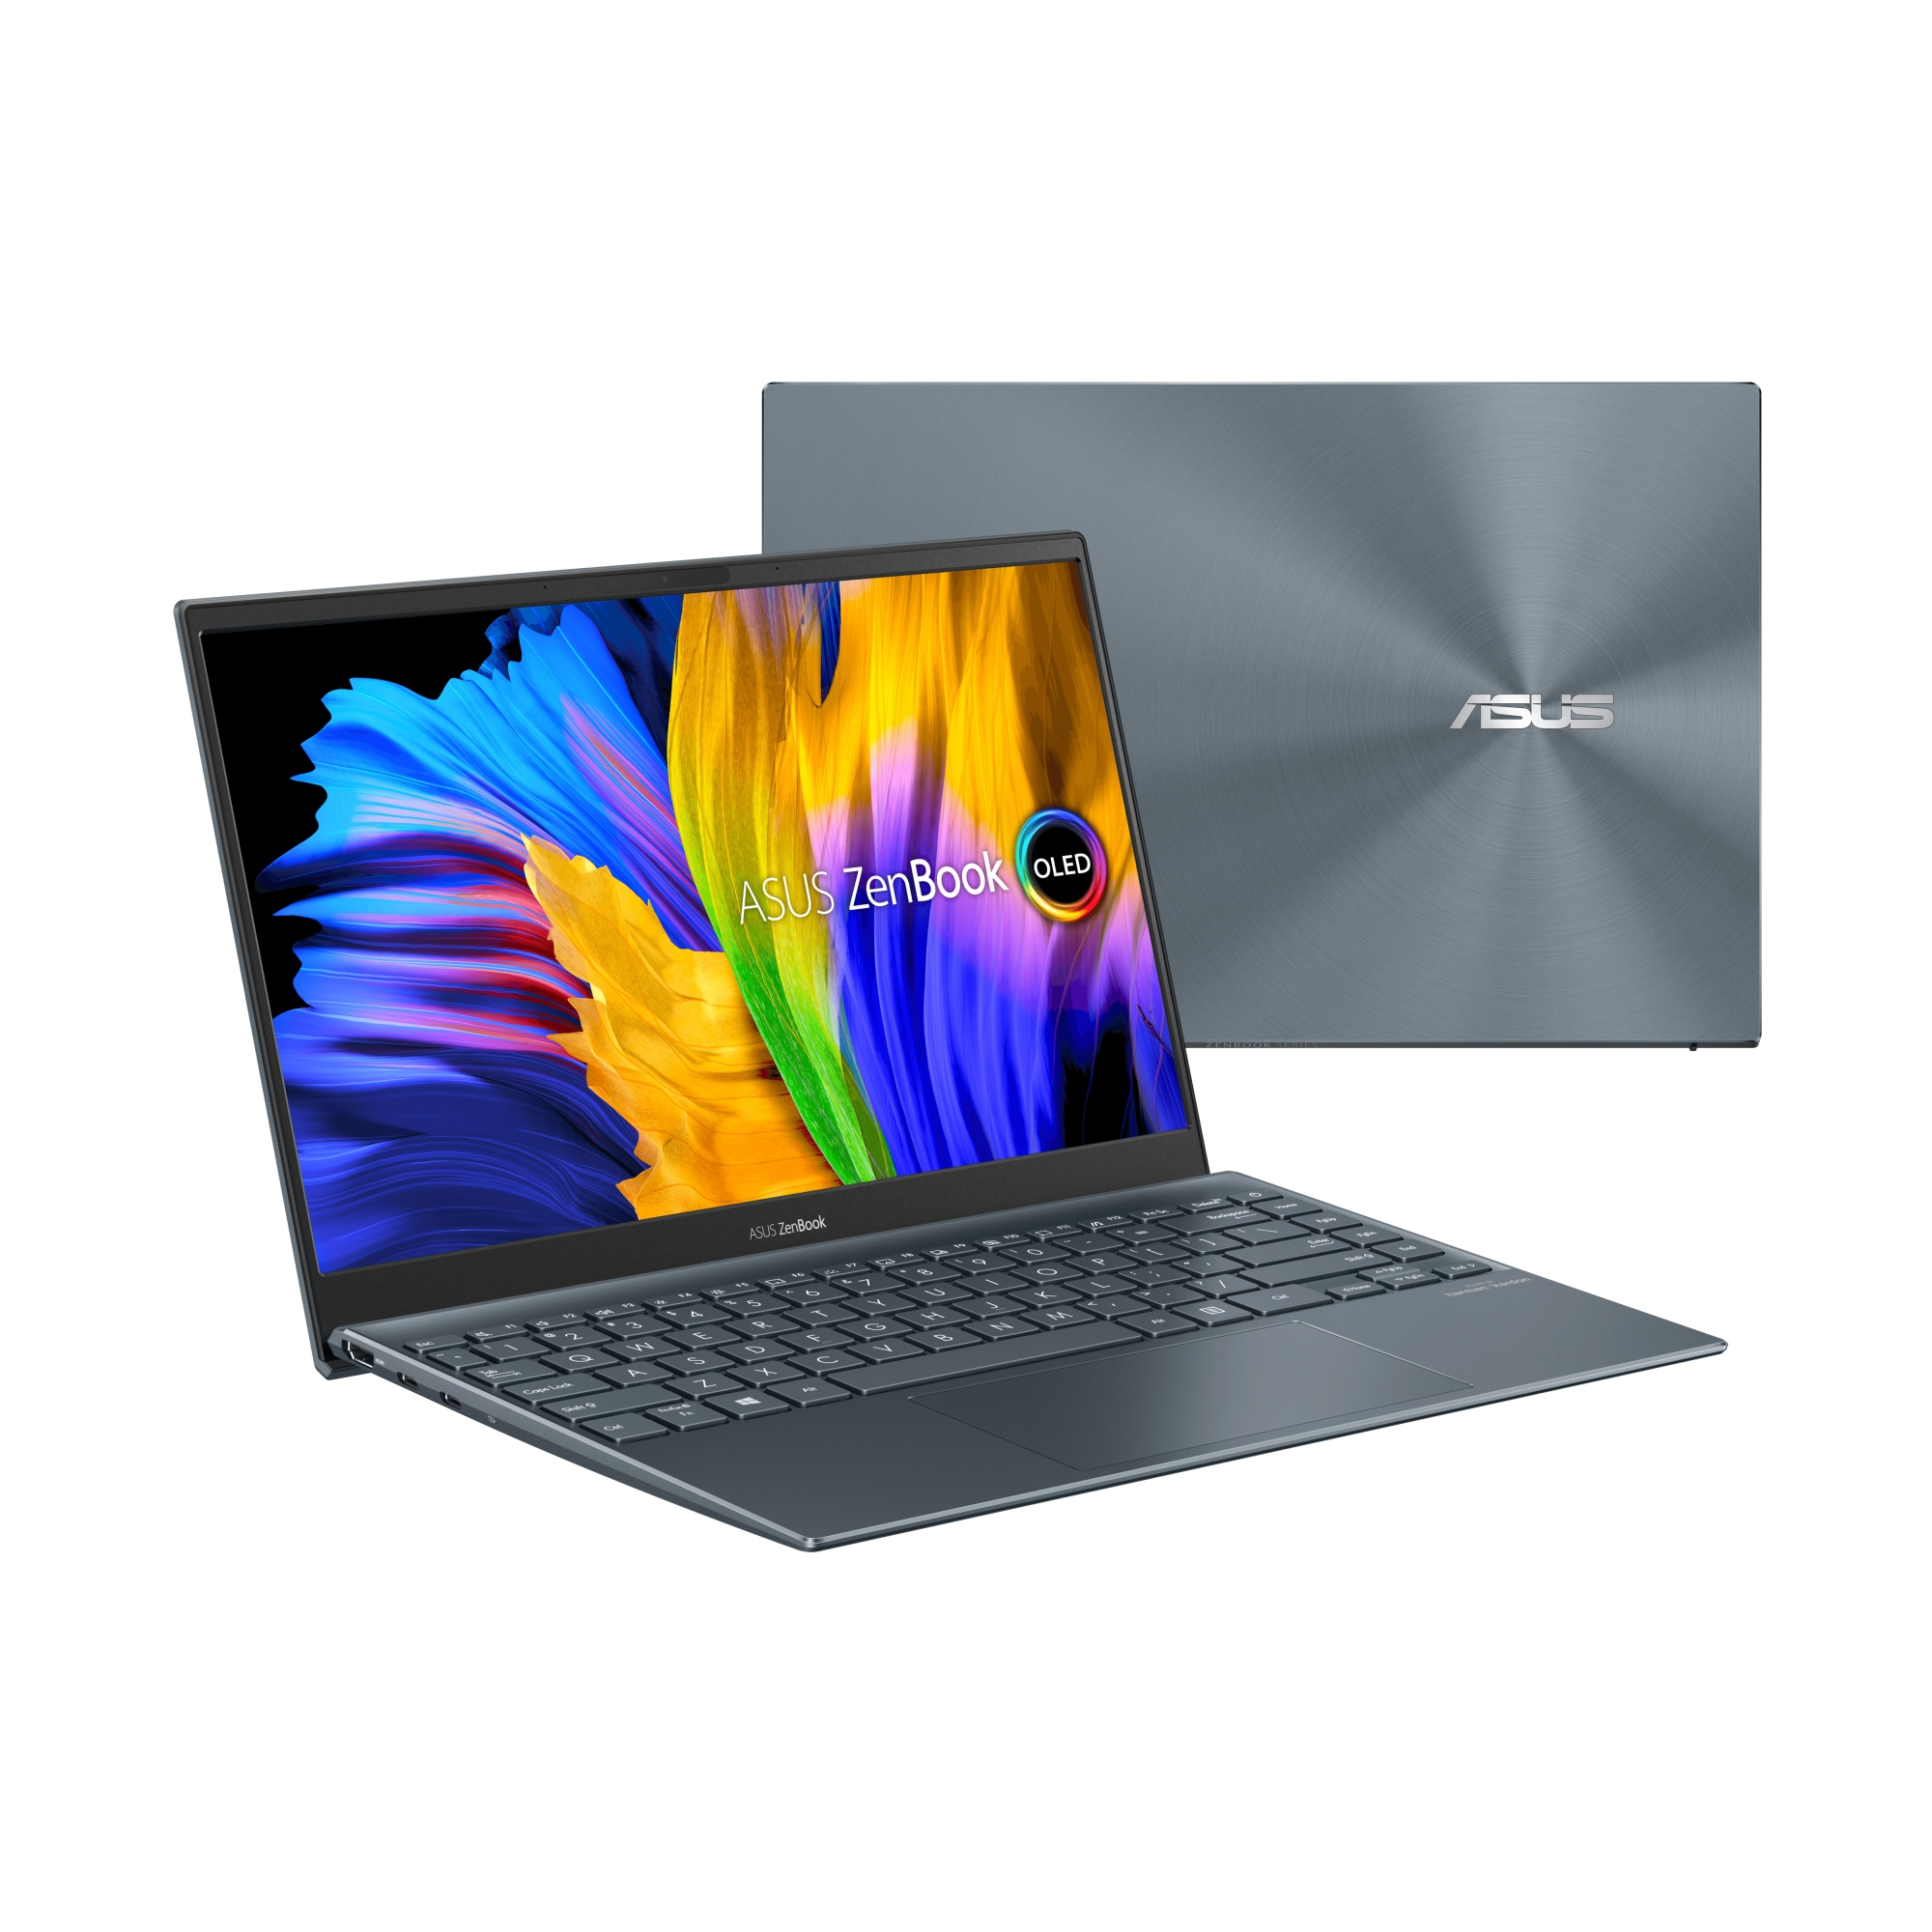 "ZENBOOK 13 OLED UM325UA-KG084 - PORTáTIL DE .3"" FULL HD (RYZEN 7 5700U, 16GB RAM, 512GB SSD, RADEON GRAPHICS, SIN SISTEMA OPERATIVO) GRIS PINO - TECLADO QWERTY ESPAñOL"